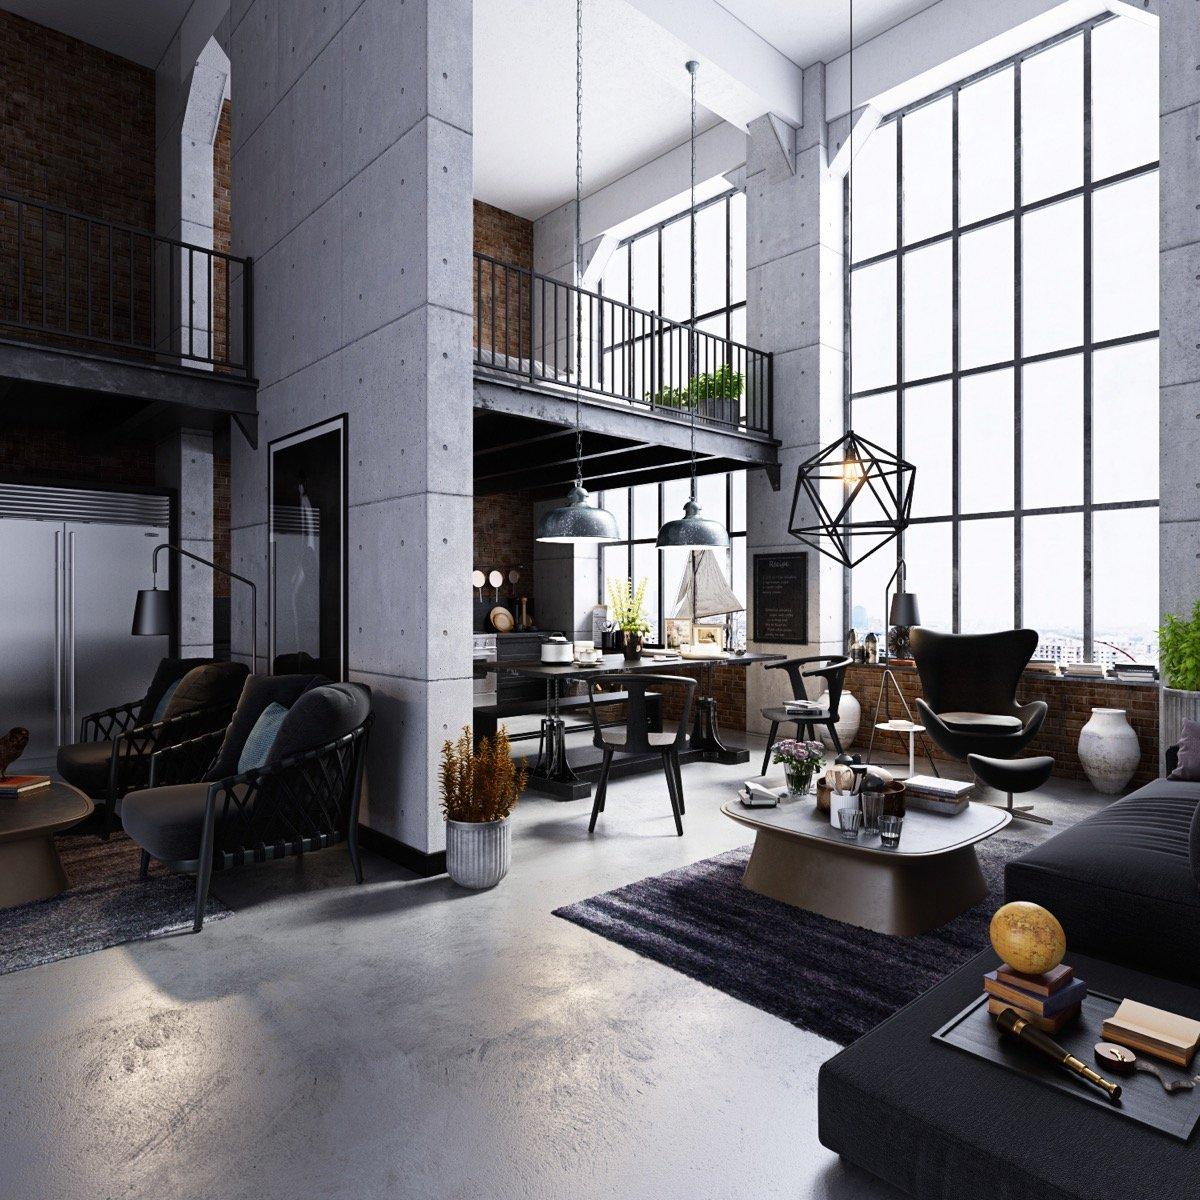 arredare-spazi-stile-industrial-2